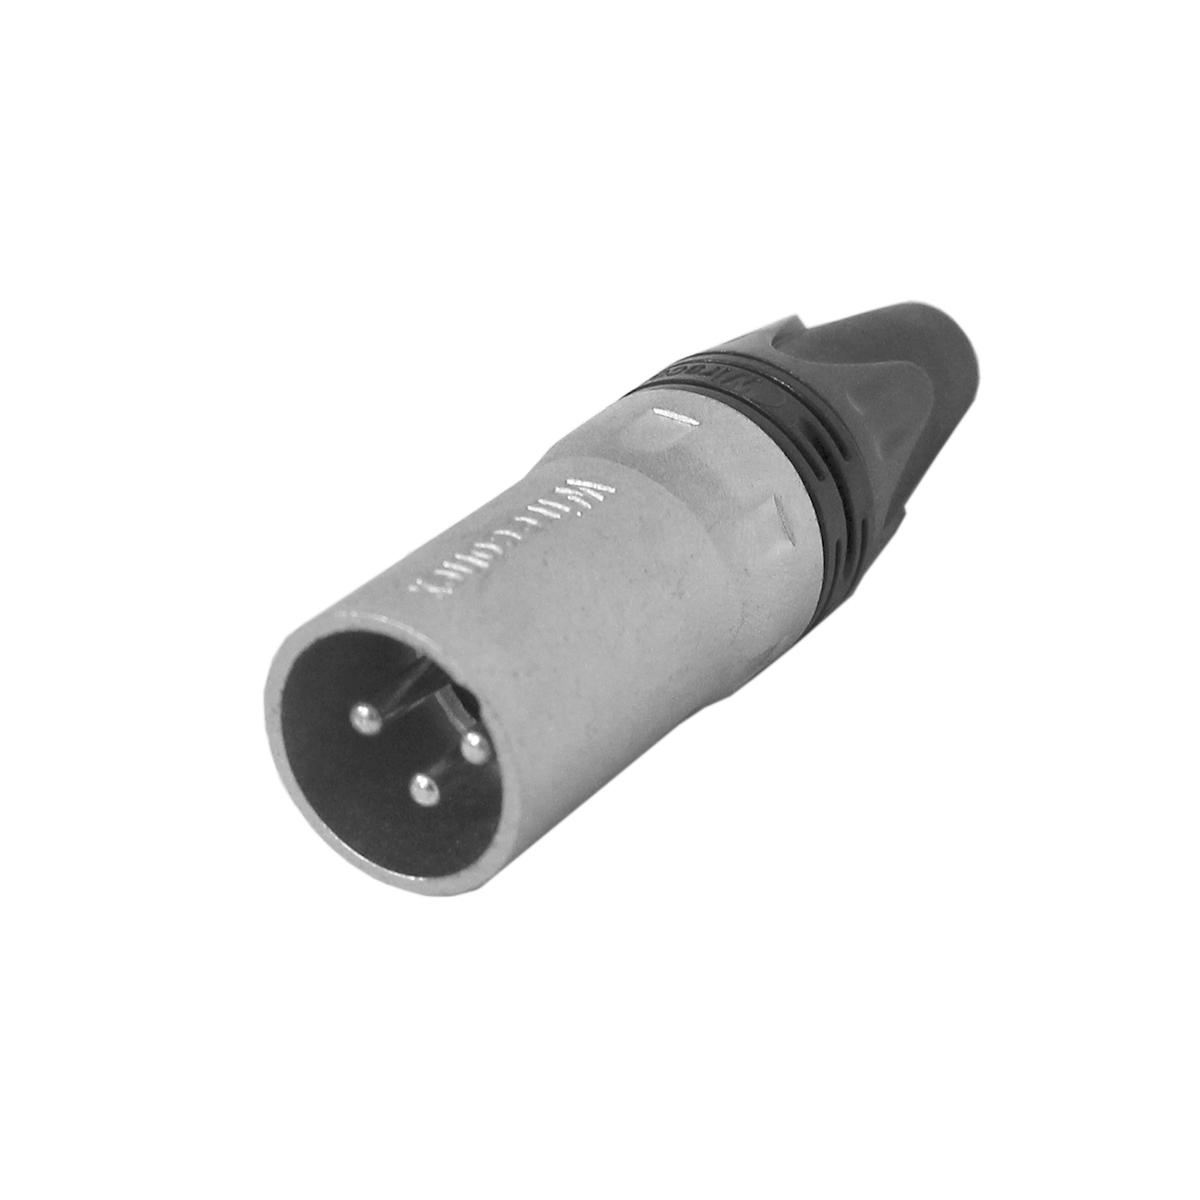 WC1013 - Conector XLR Macho Linha WC 1013 - Wireconex